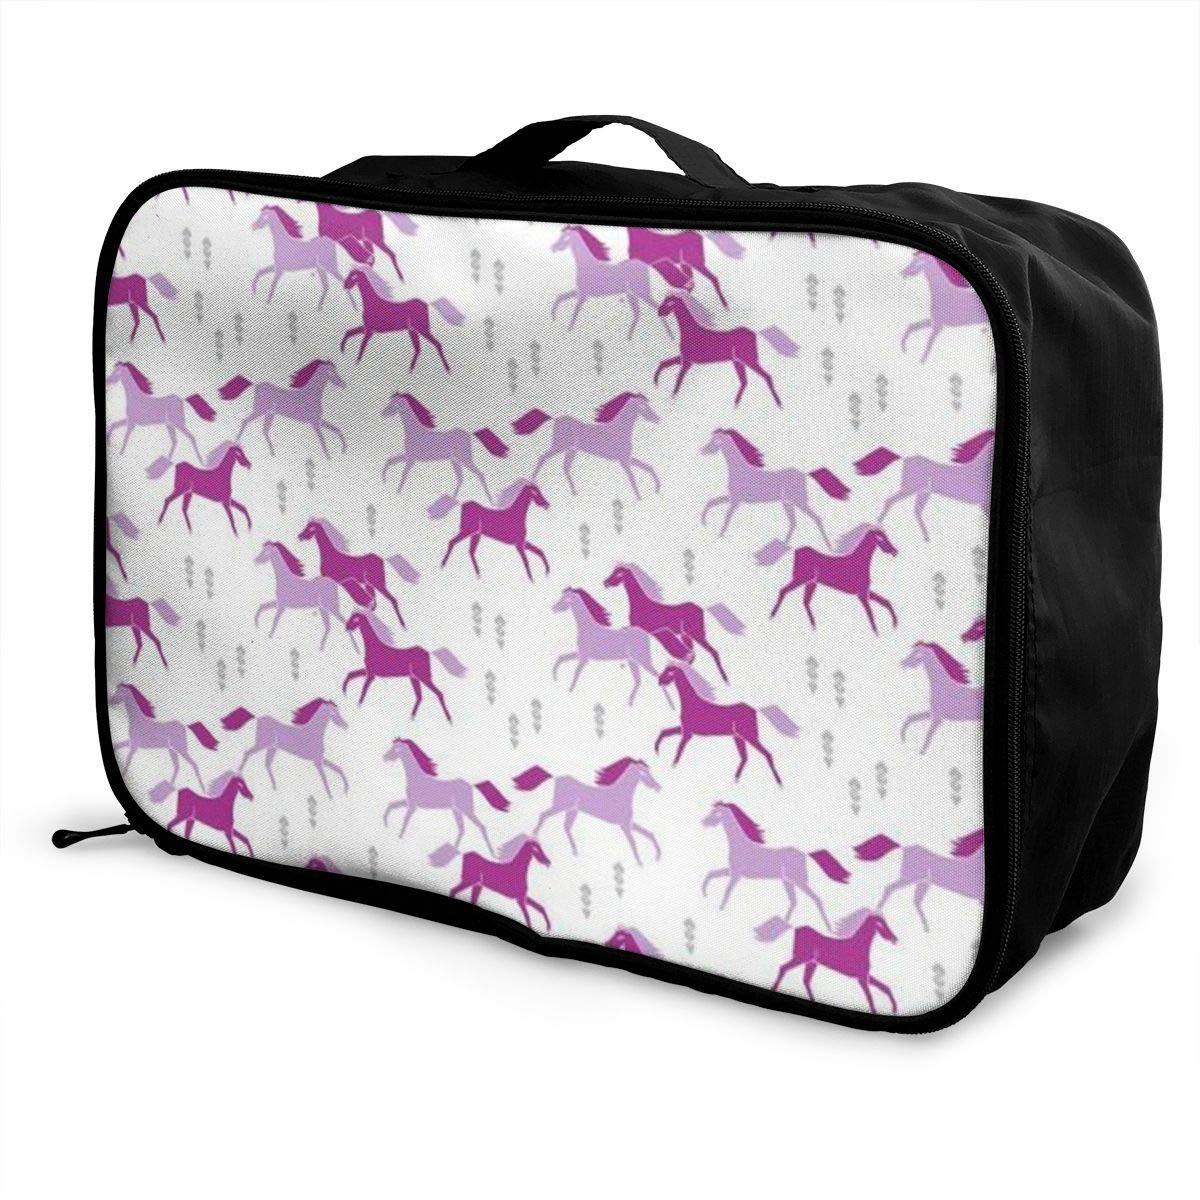 ADGAI Wild Horses Purple Lavender Canvas Travel Weekender Bag,Fashion Custom Lightweight Large Capacity Portable Luggage Bag,Suitcase Trolley Bag